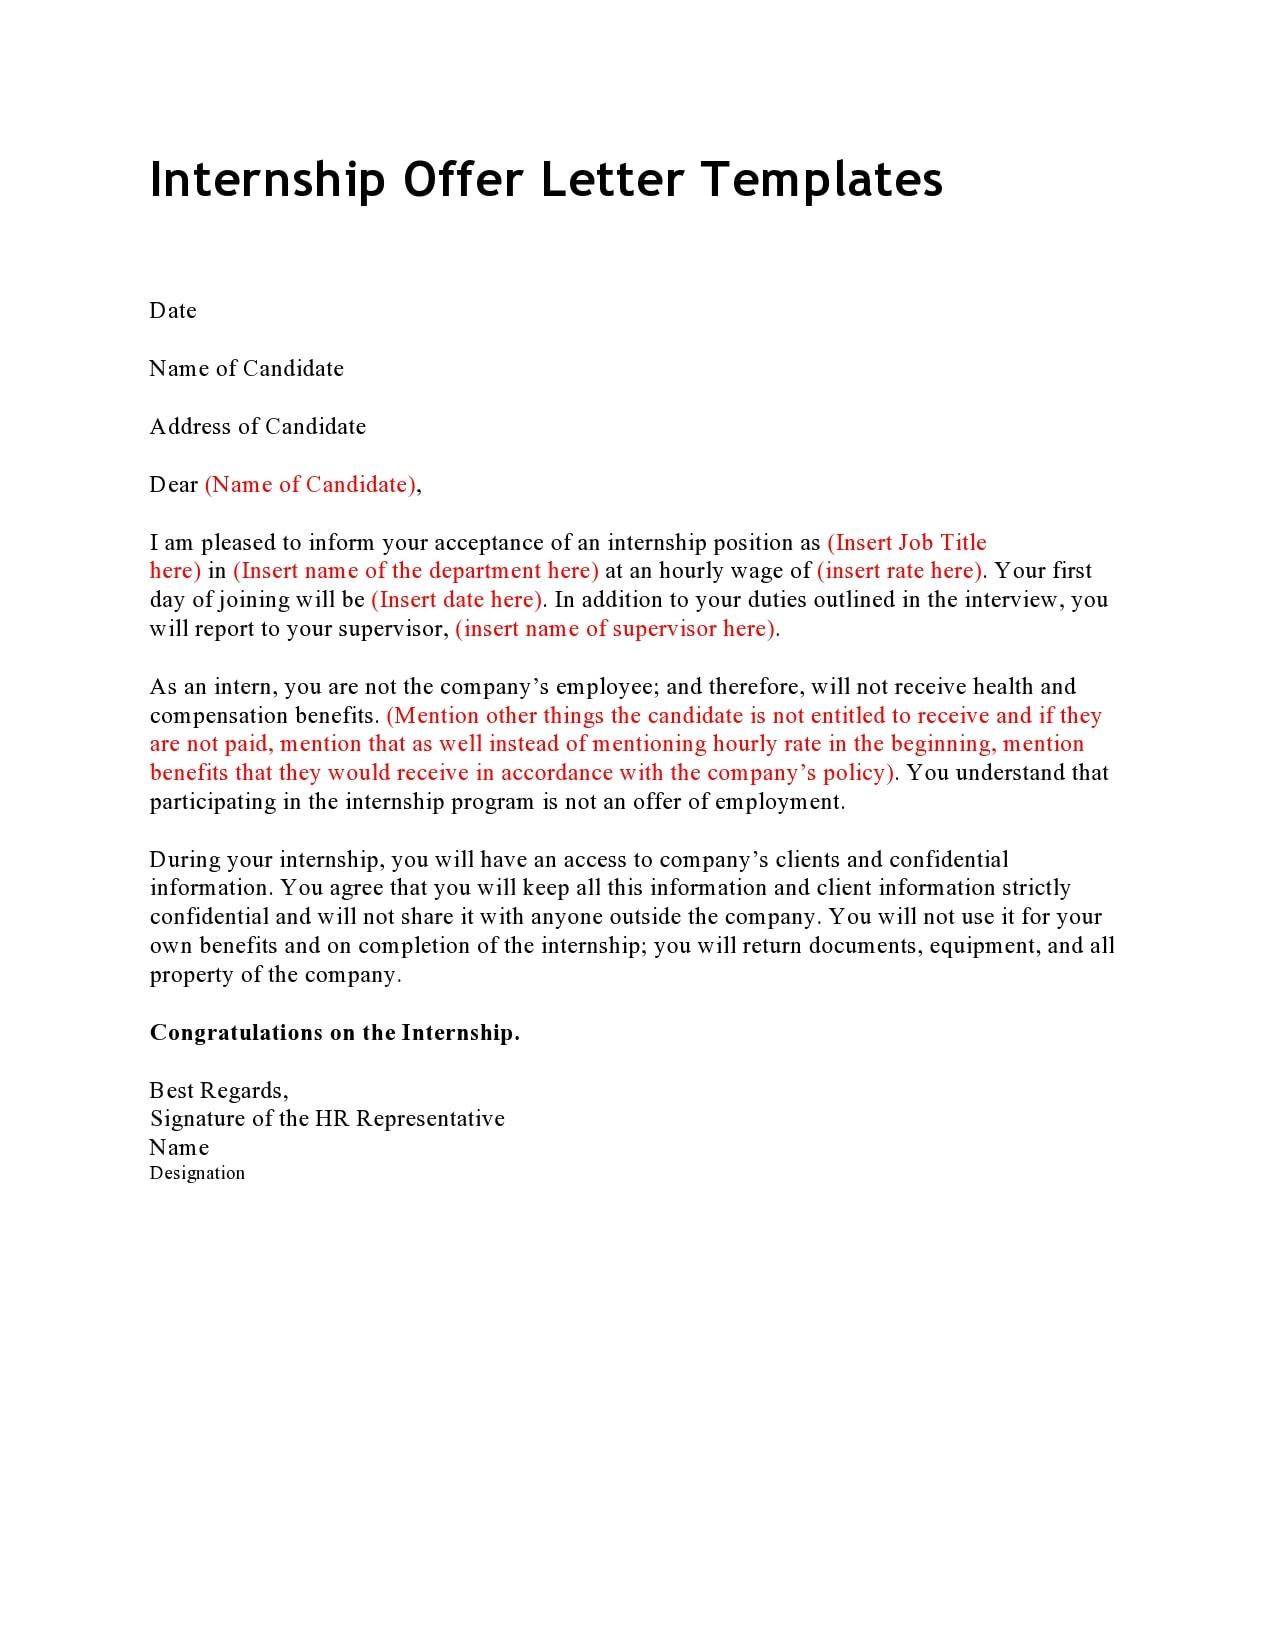 internship offer letter 01